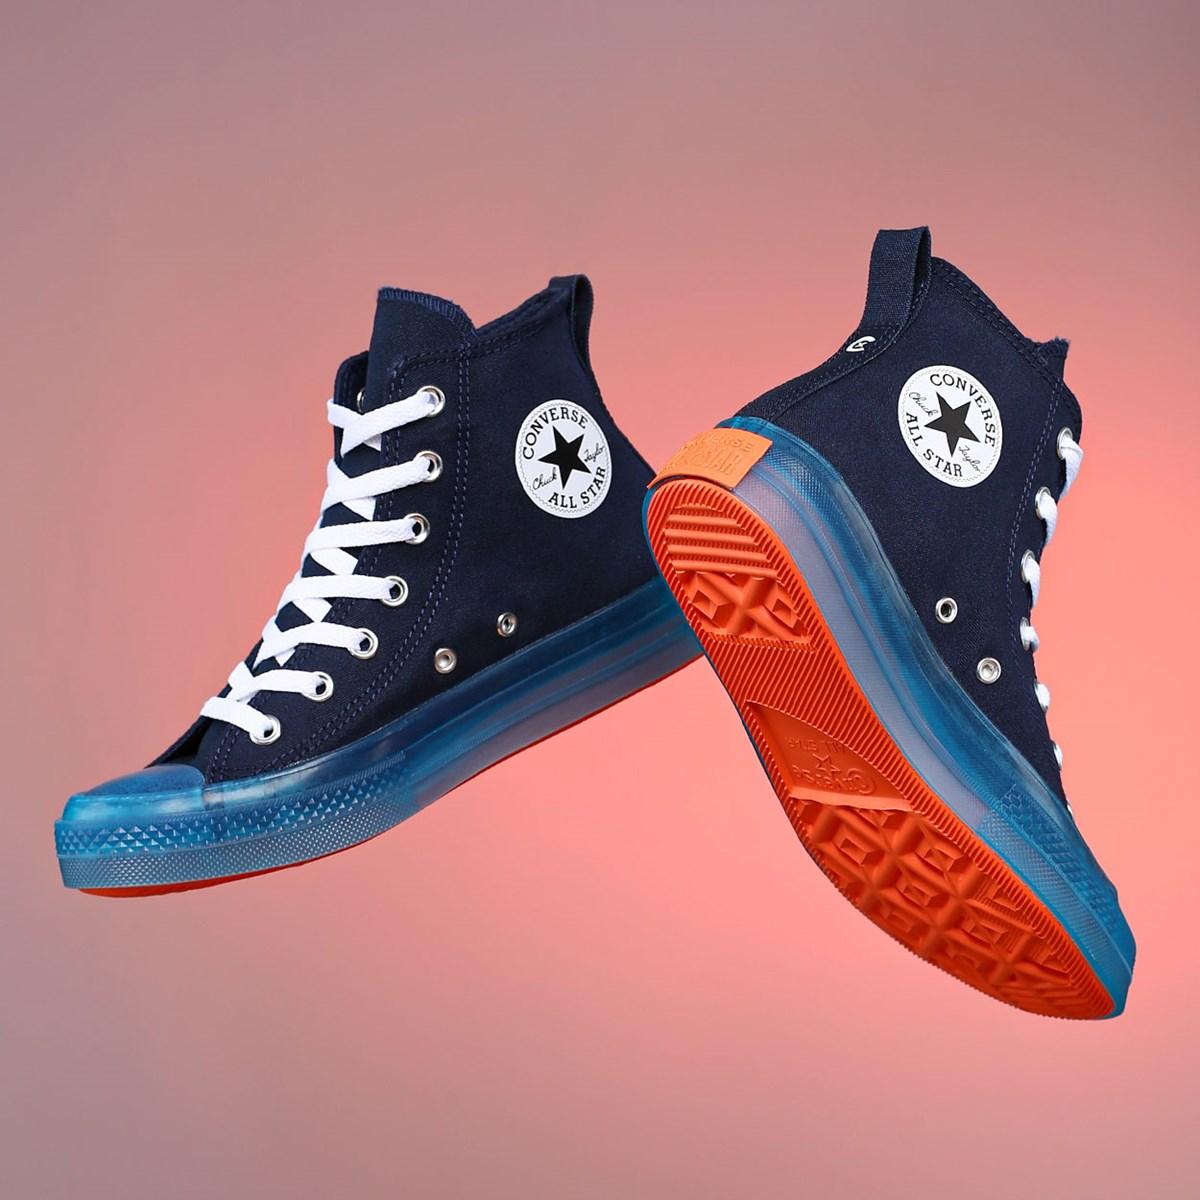 Tênis Converse Chuck Taylor All Star CX Canvas Color Hi Obsidian Sail Blue Wild Mango 168566C